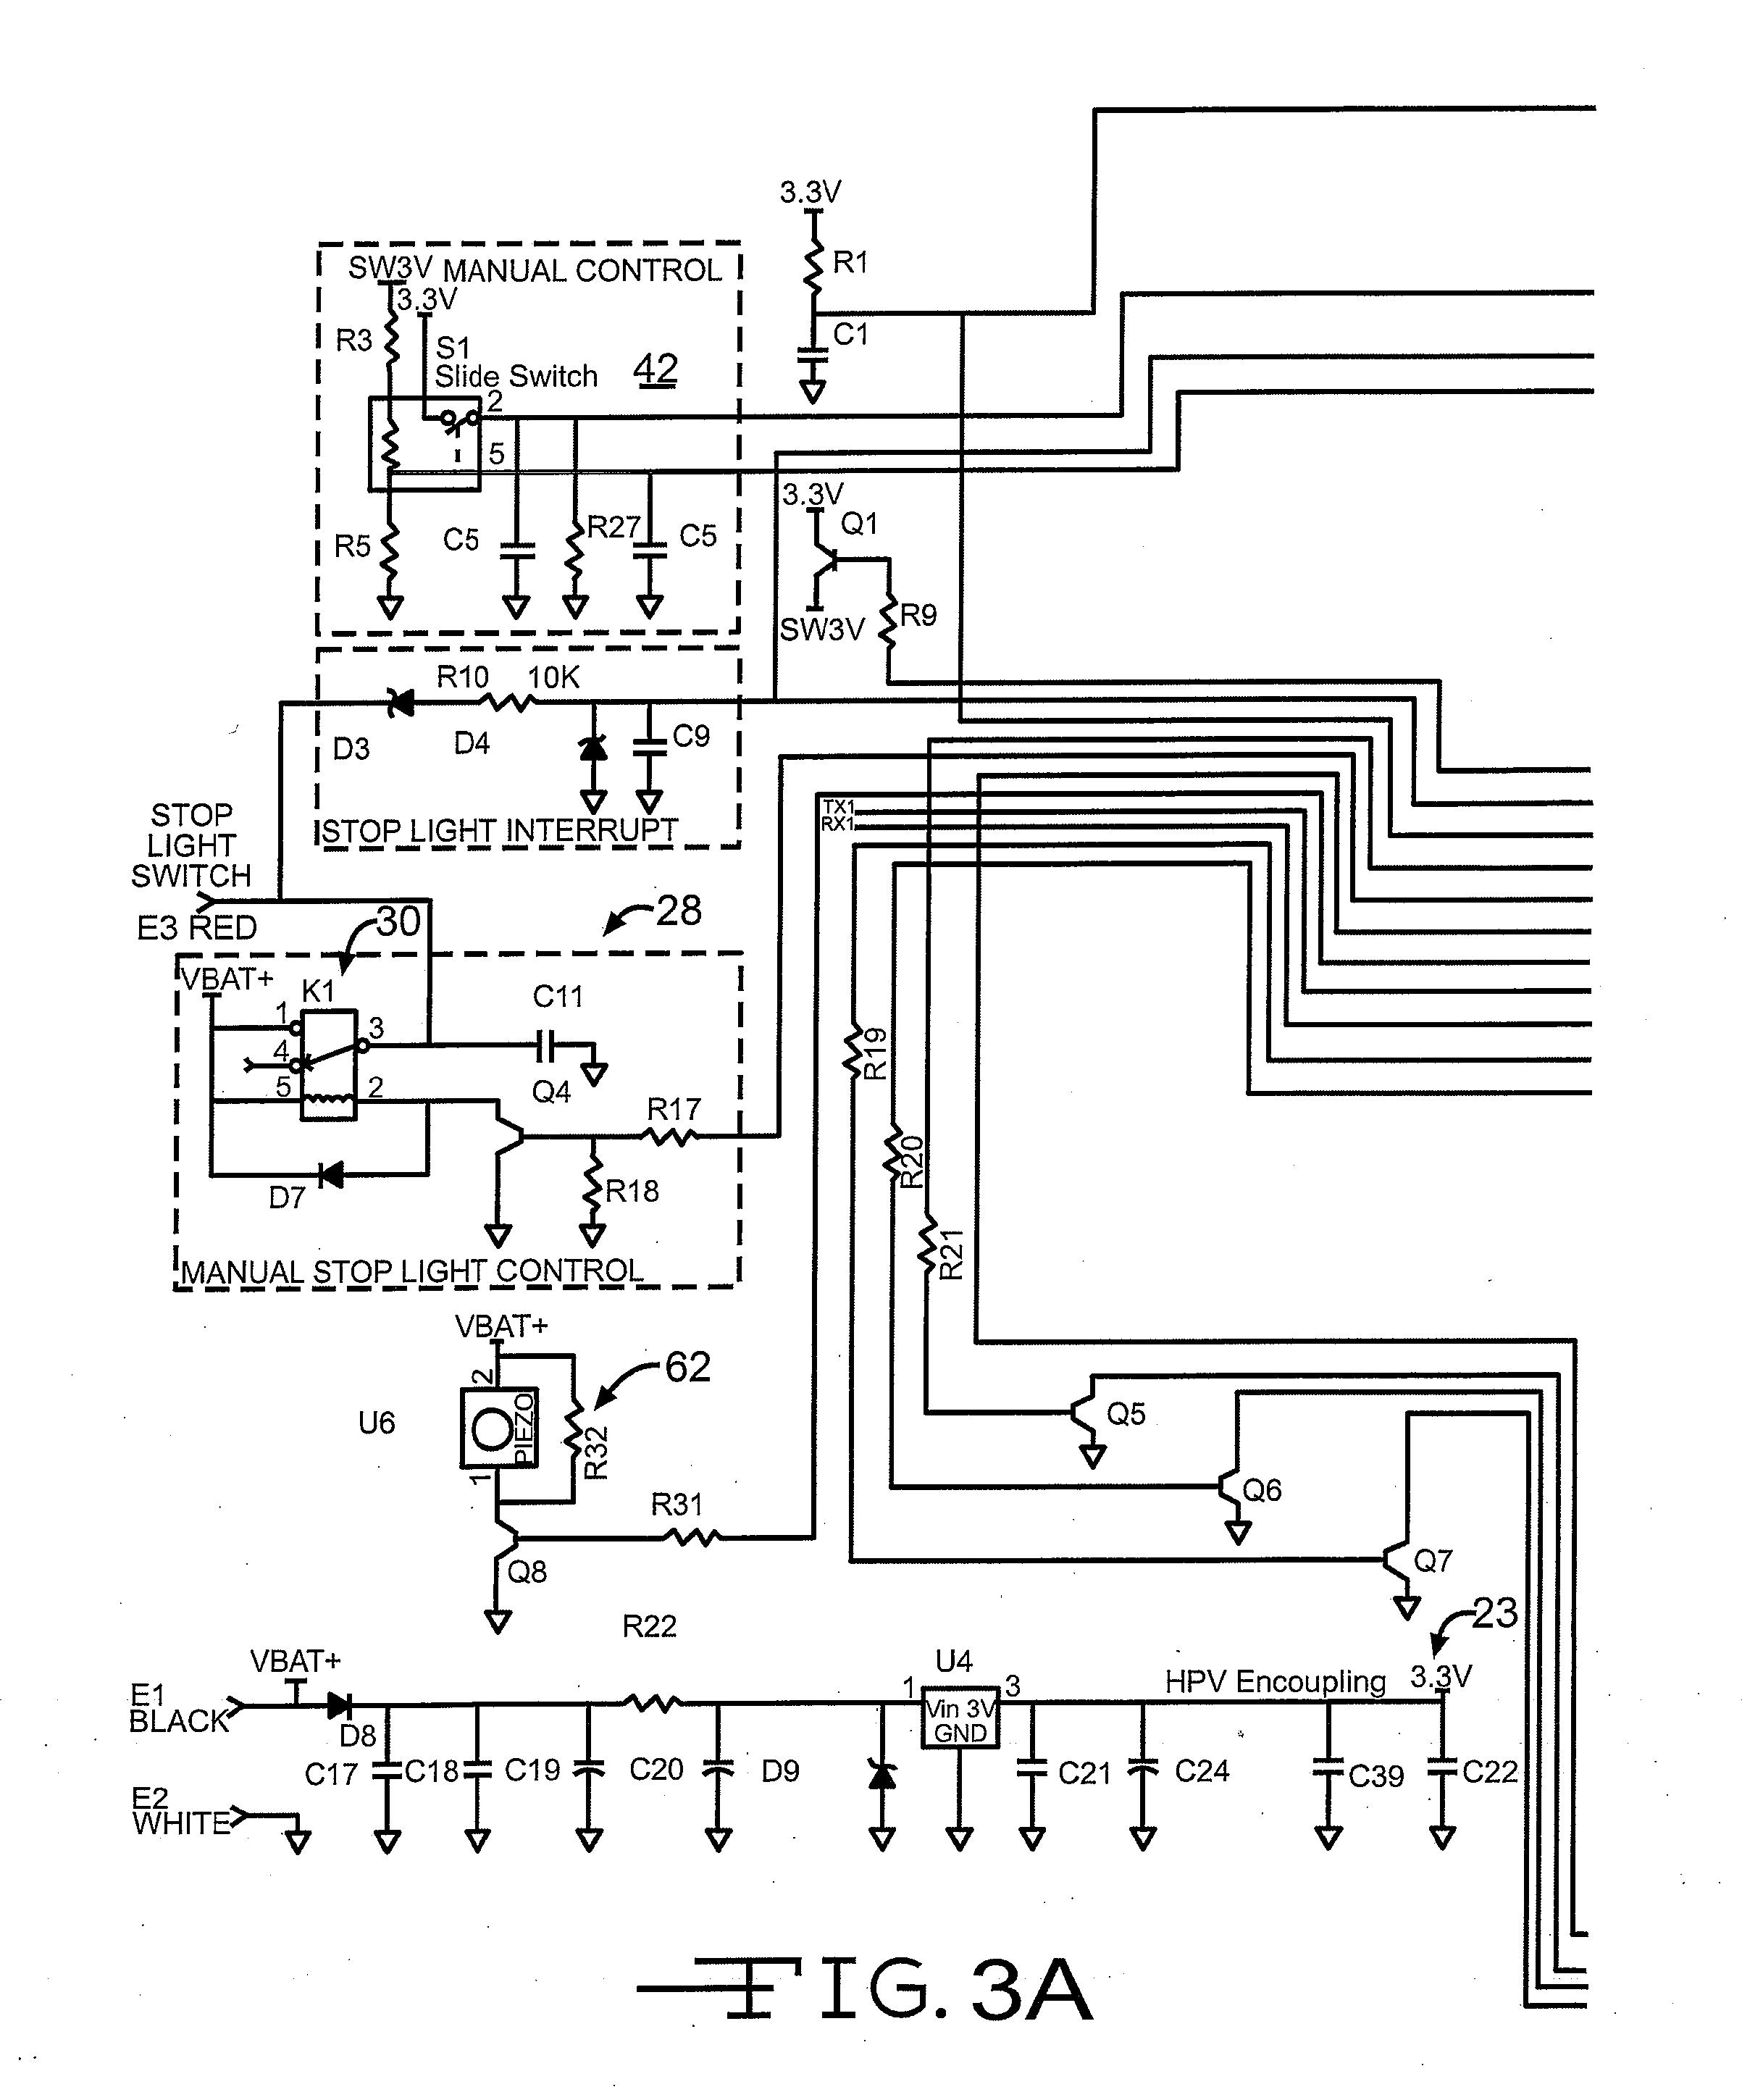 hm 2382  prodigy thermostat wire diagram prodigy circuit